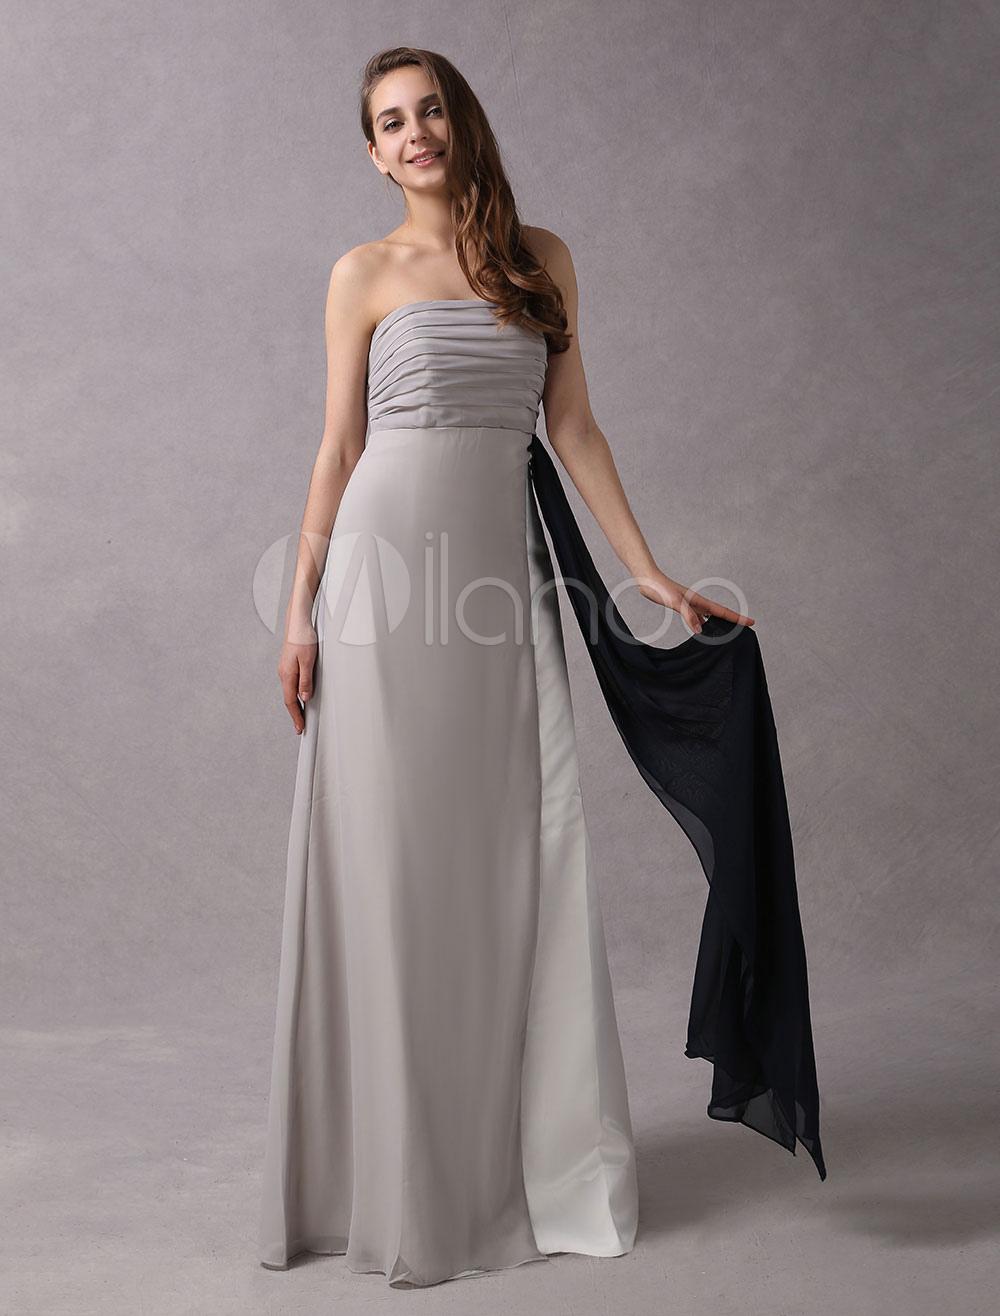 A-line Silver Chiffon Maternity Bridesmaid Dress with Empire Waist